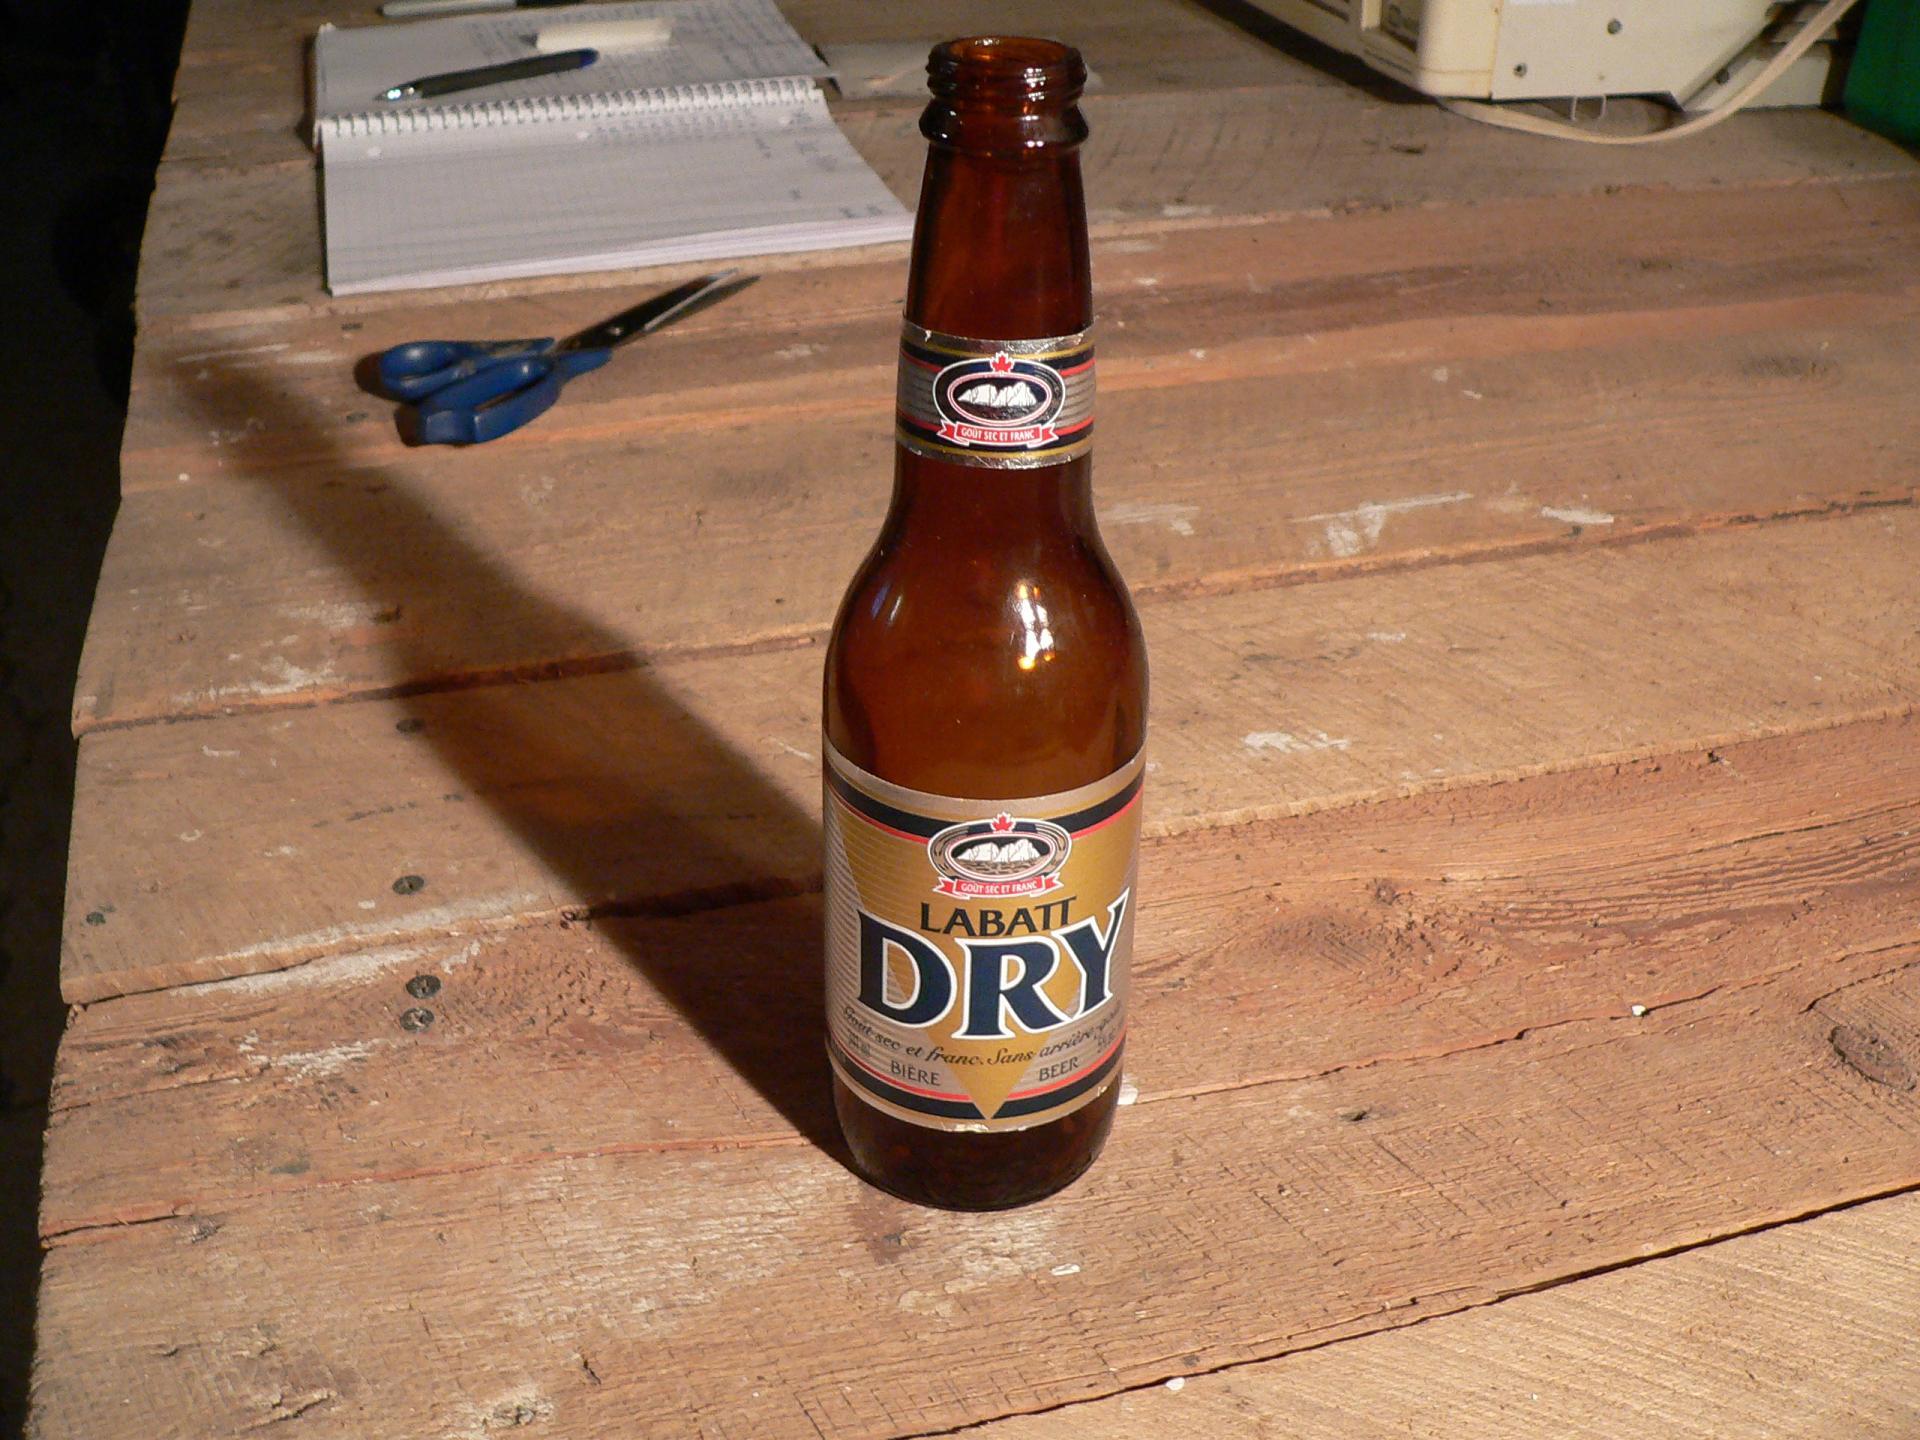 Bière labatt dry # 4739.11